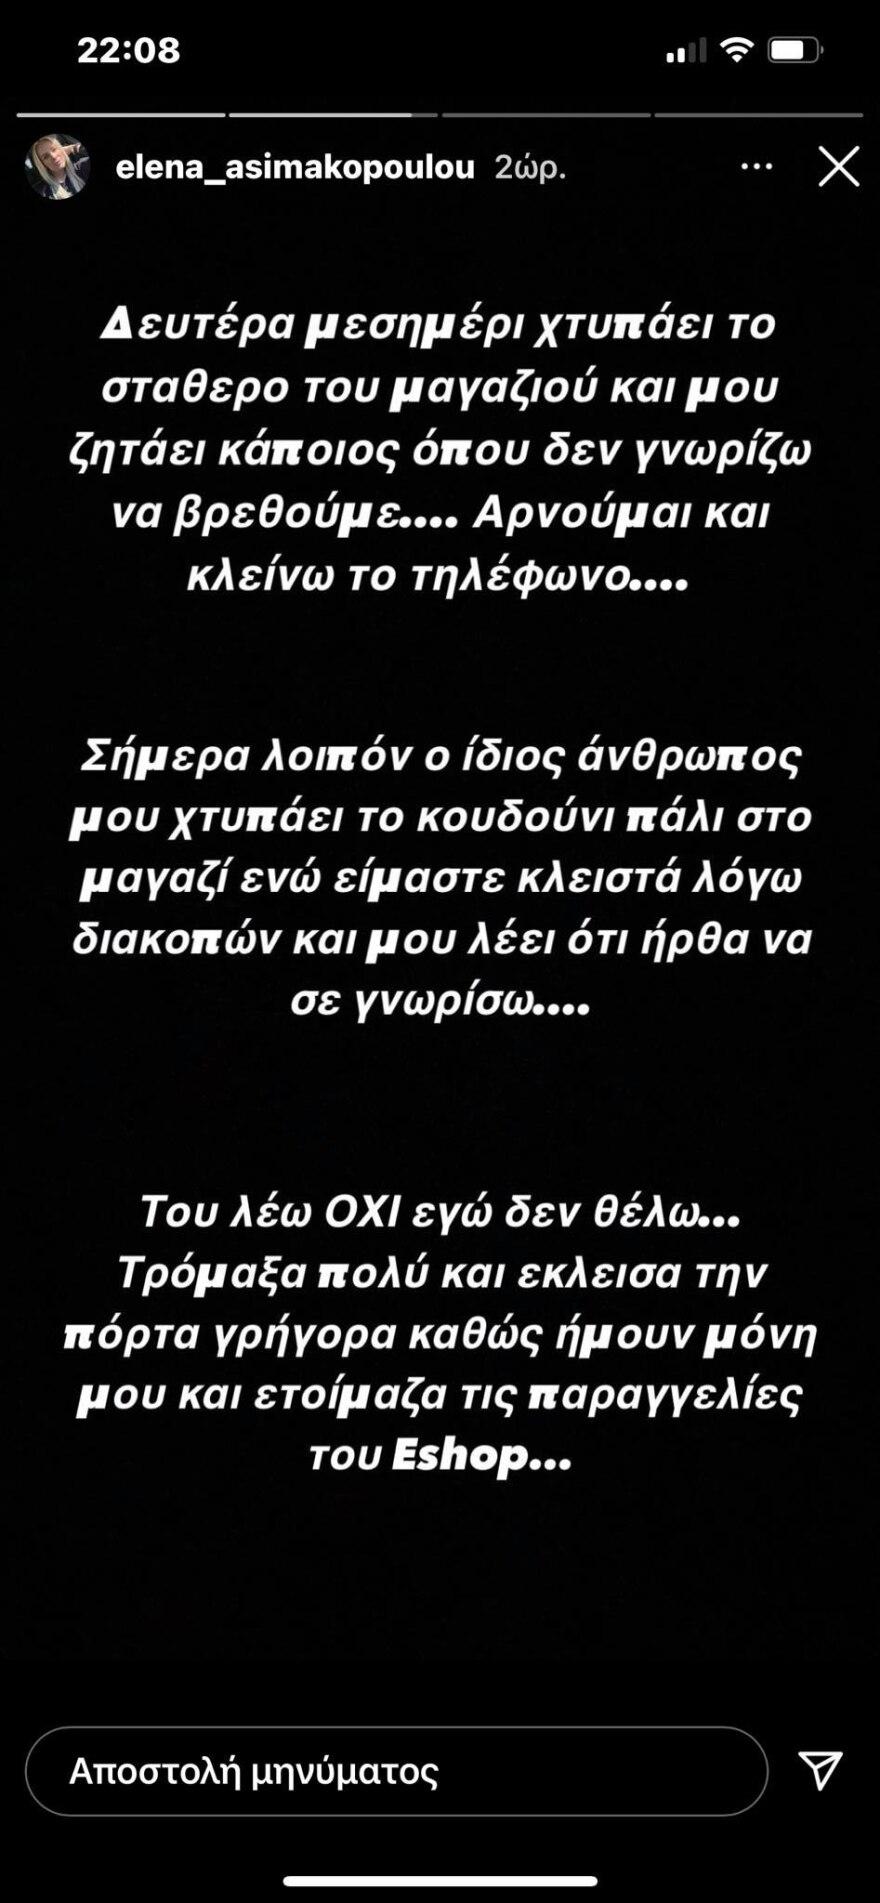 Elena_Asimakopoulou